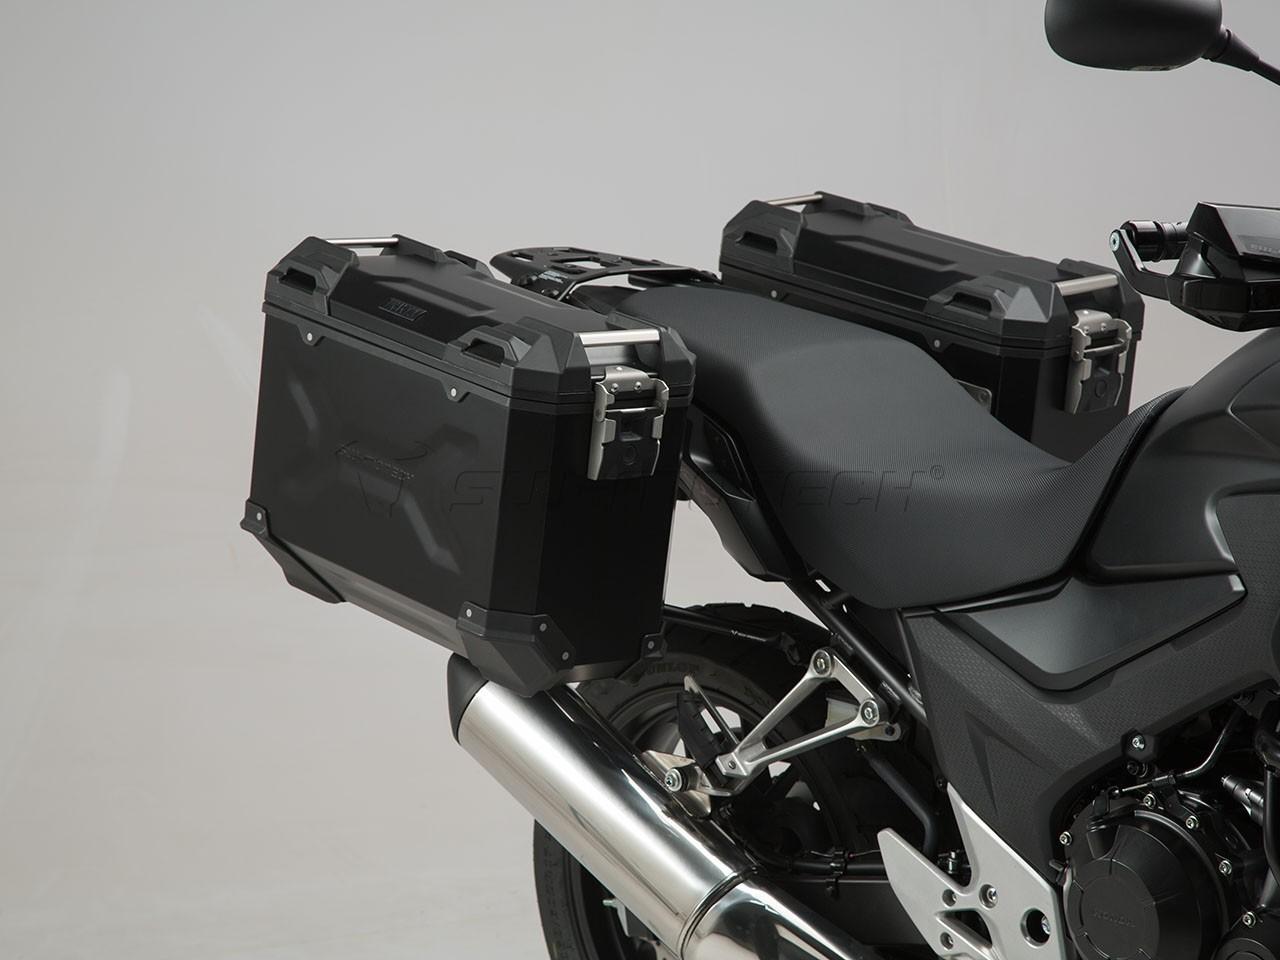 Honda CB 500 F (13-15) - sada bočních kufrů TRAX Adventure 37 l.